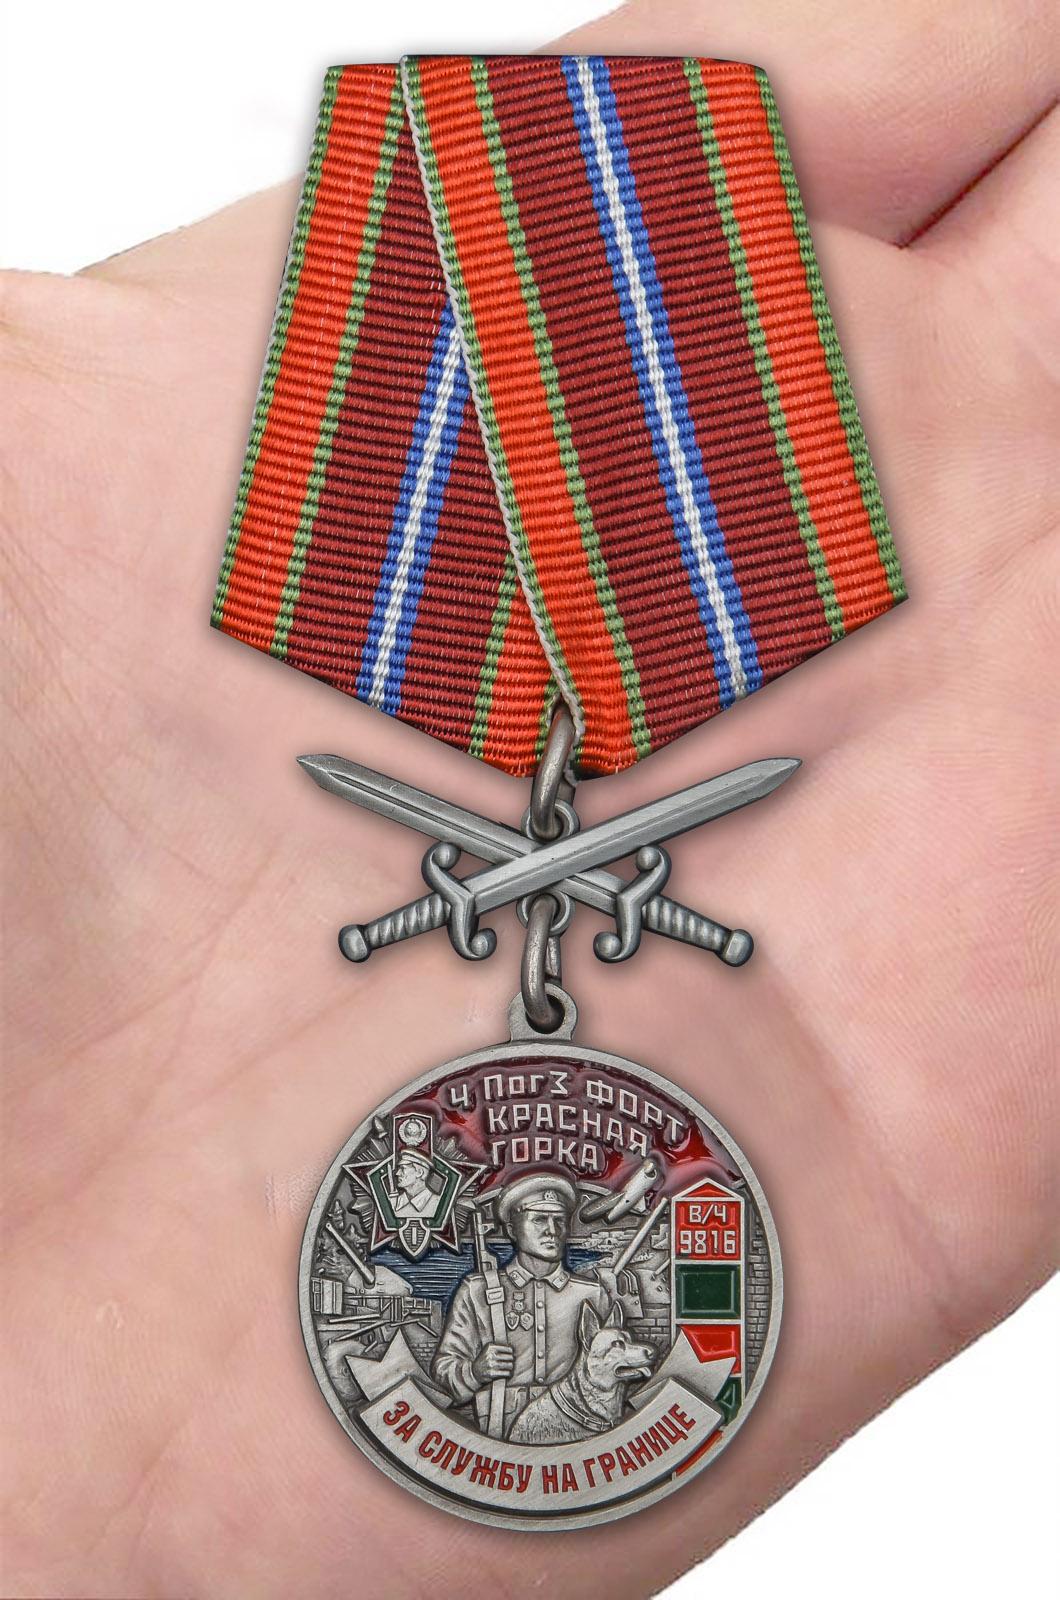 Нагрудная медаль За службу на ПогЗ Красная горка - вид на ладони